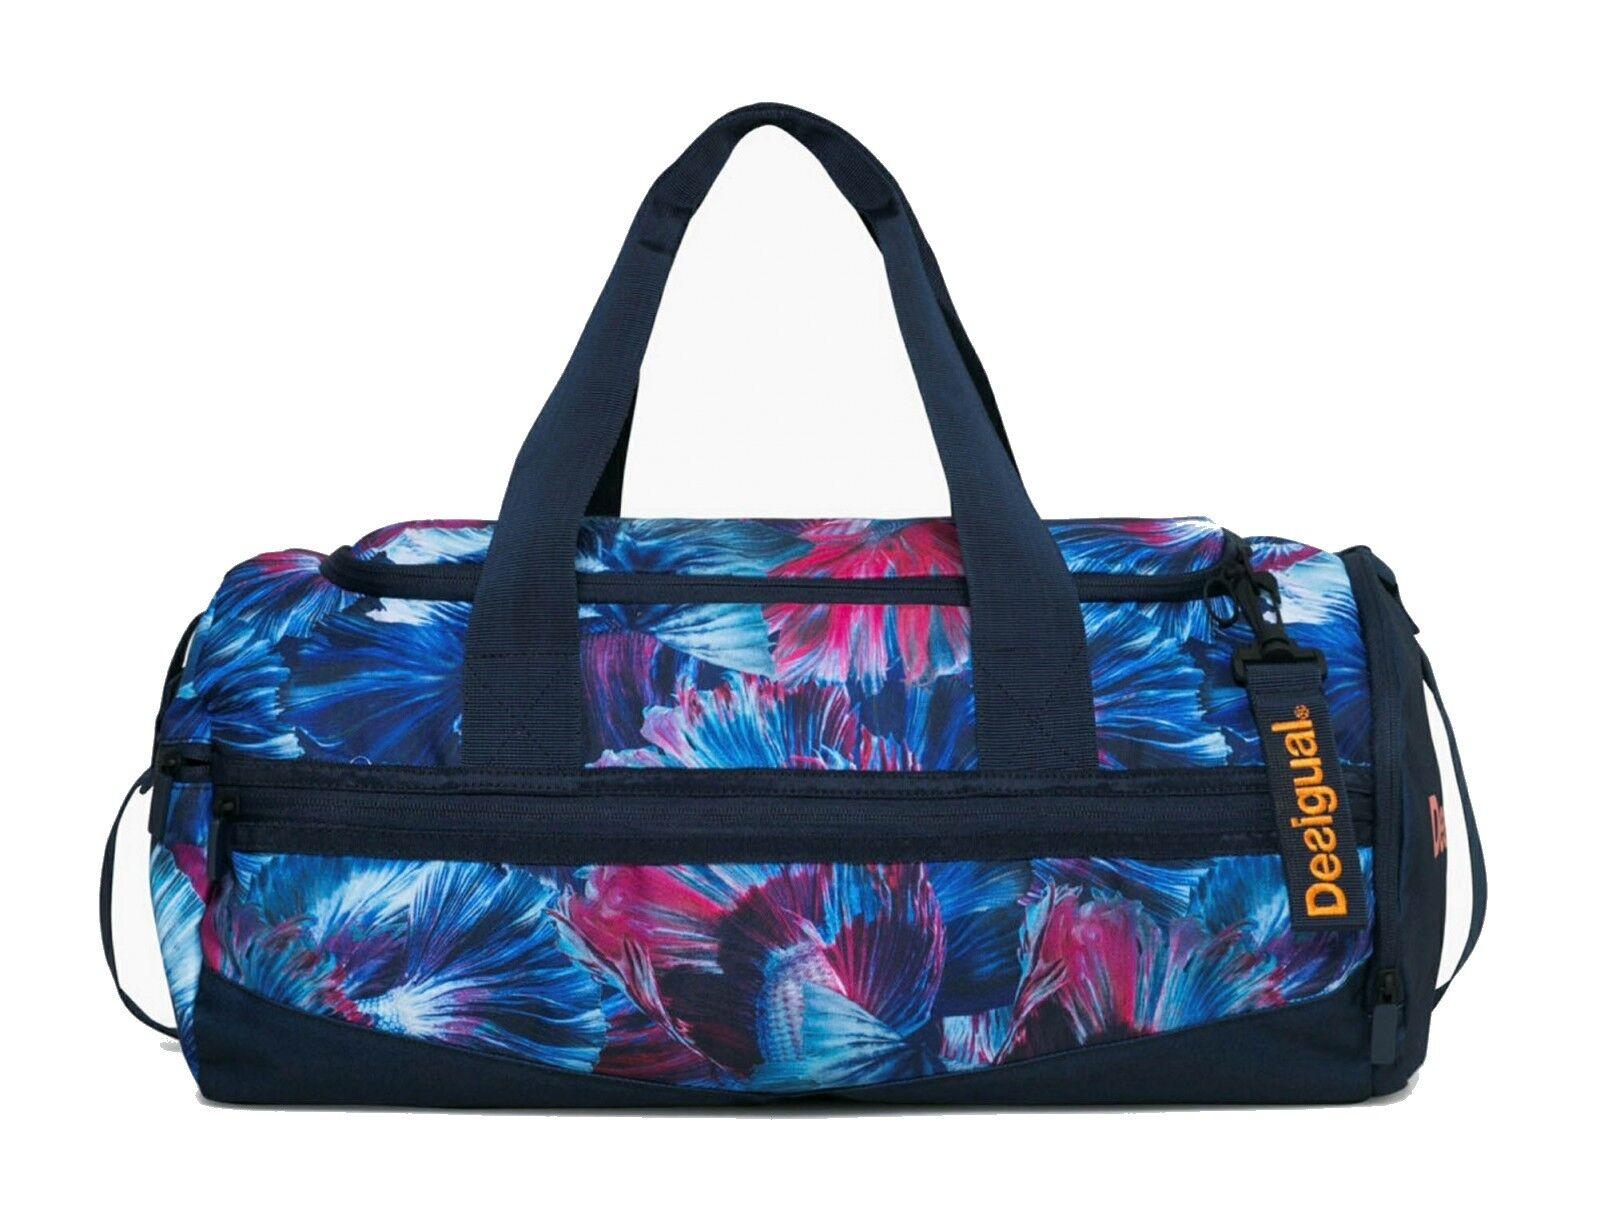 Desigual Borsa  Sportiva Atlantis Tube Shoulder Bag  there are more brands of high-quality goods